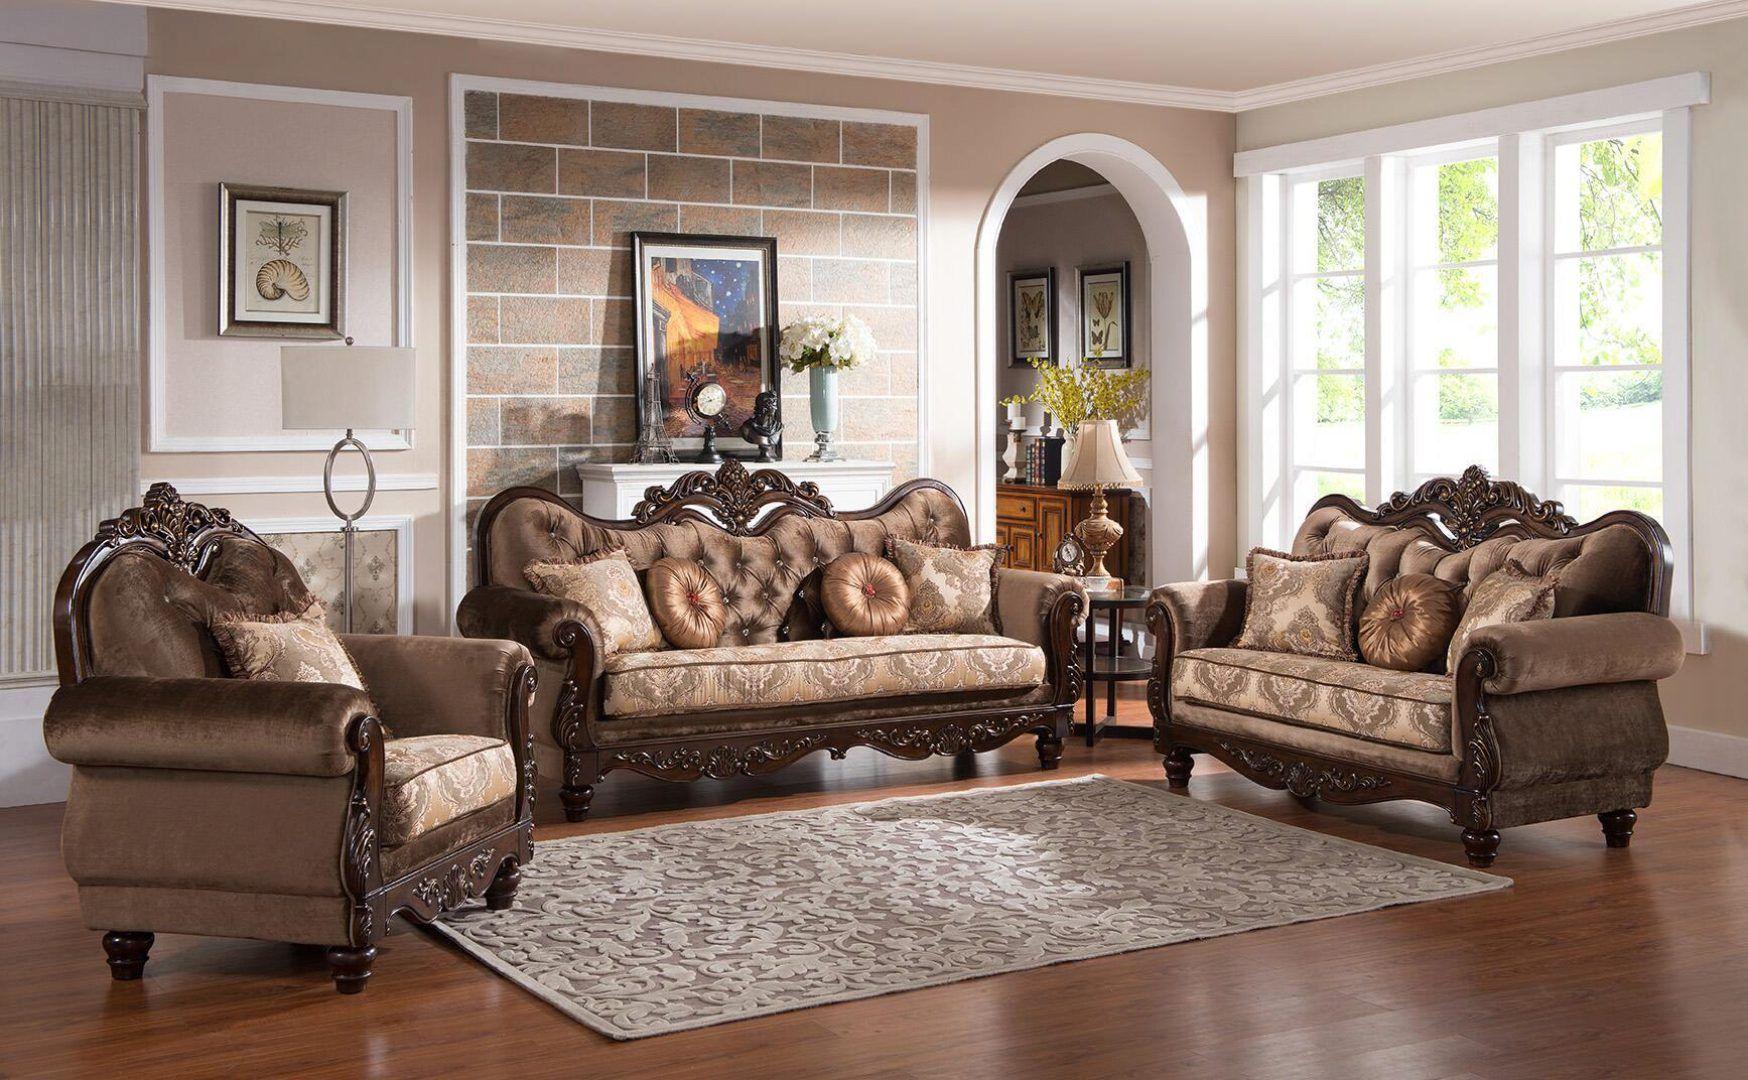 Cherry Finish Wood Sofa Set 3Pcs Traditional Cosmos Furniture Zoya